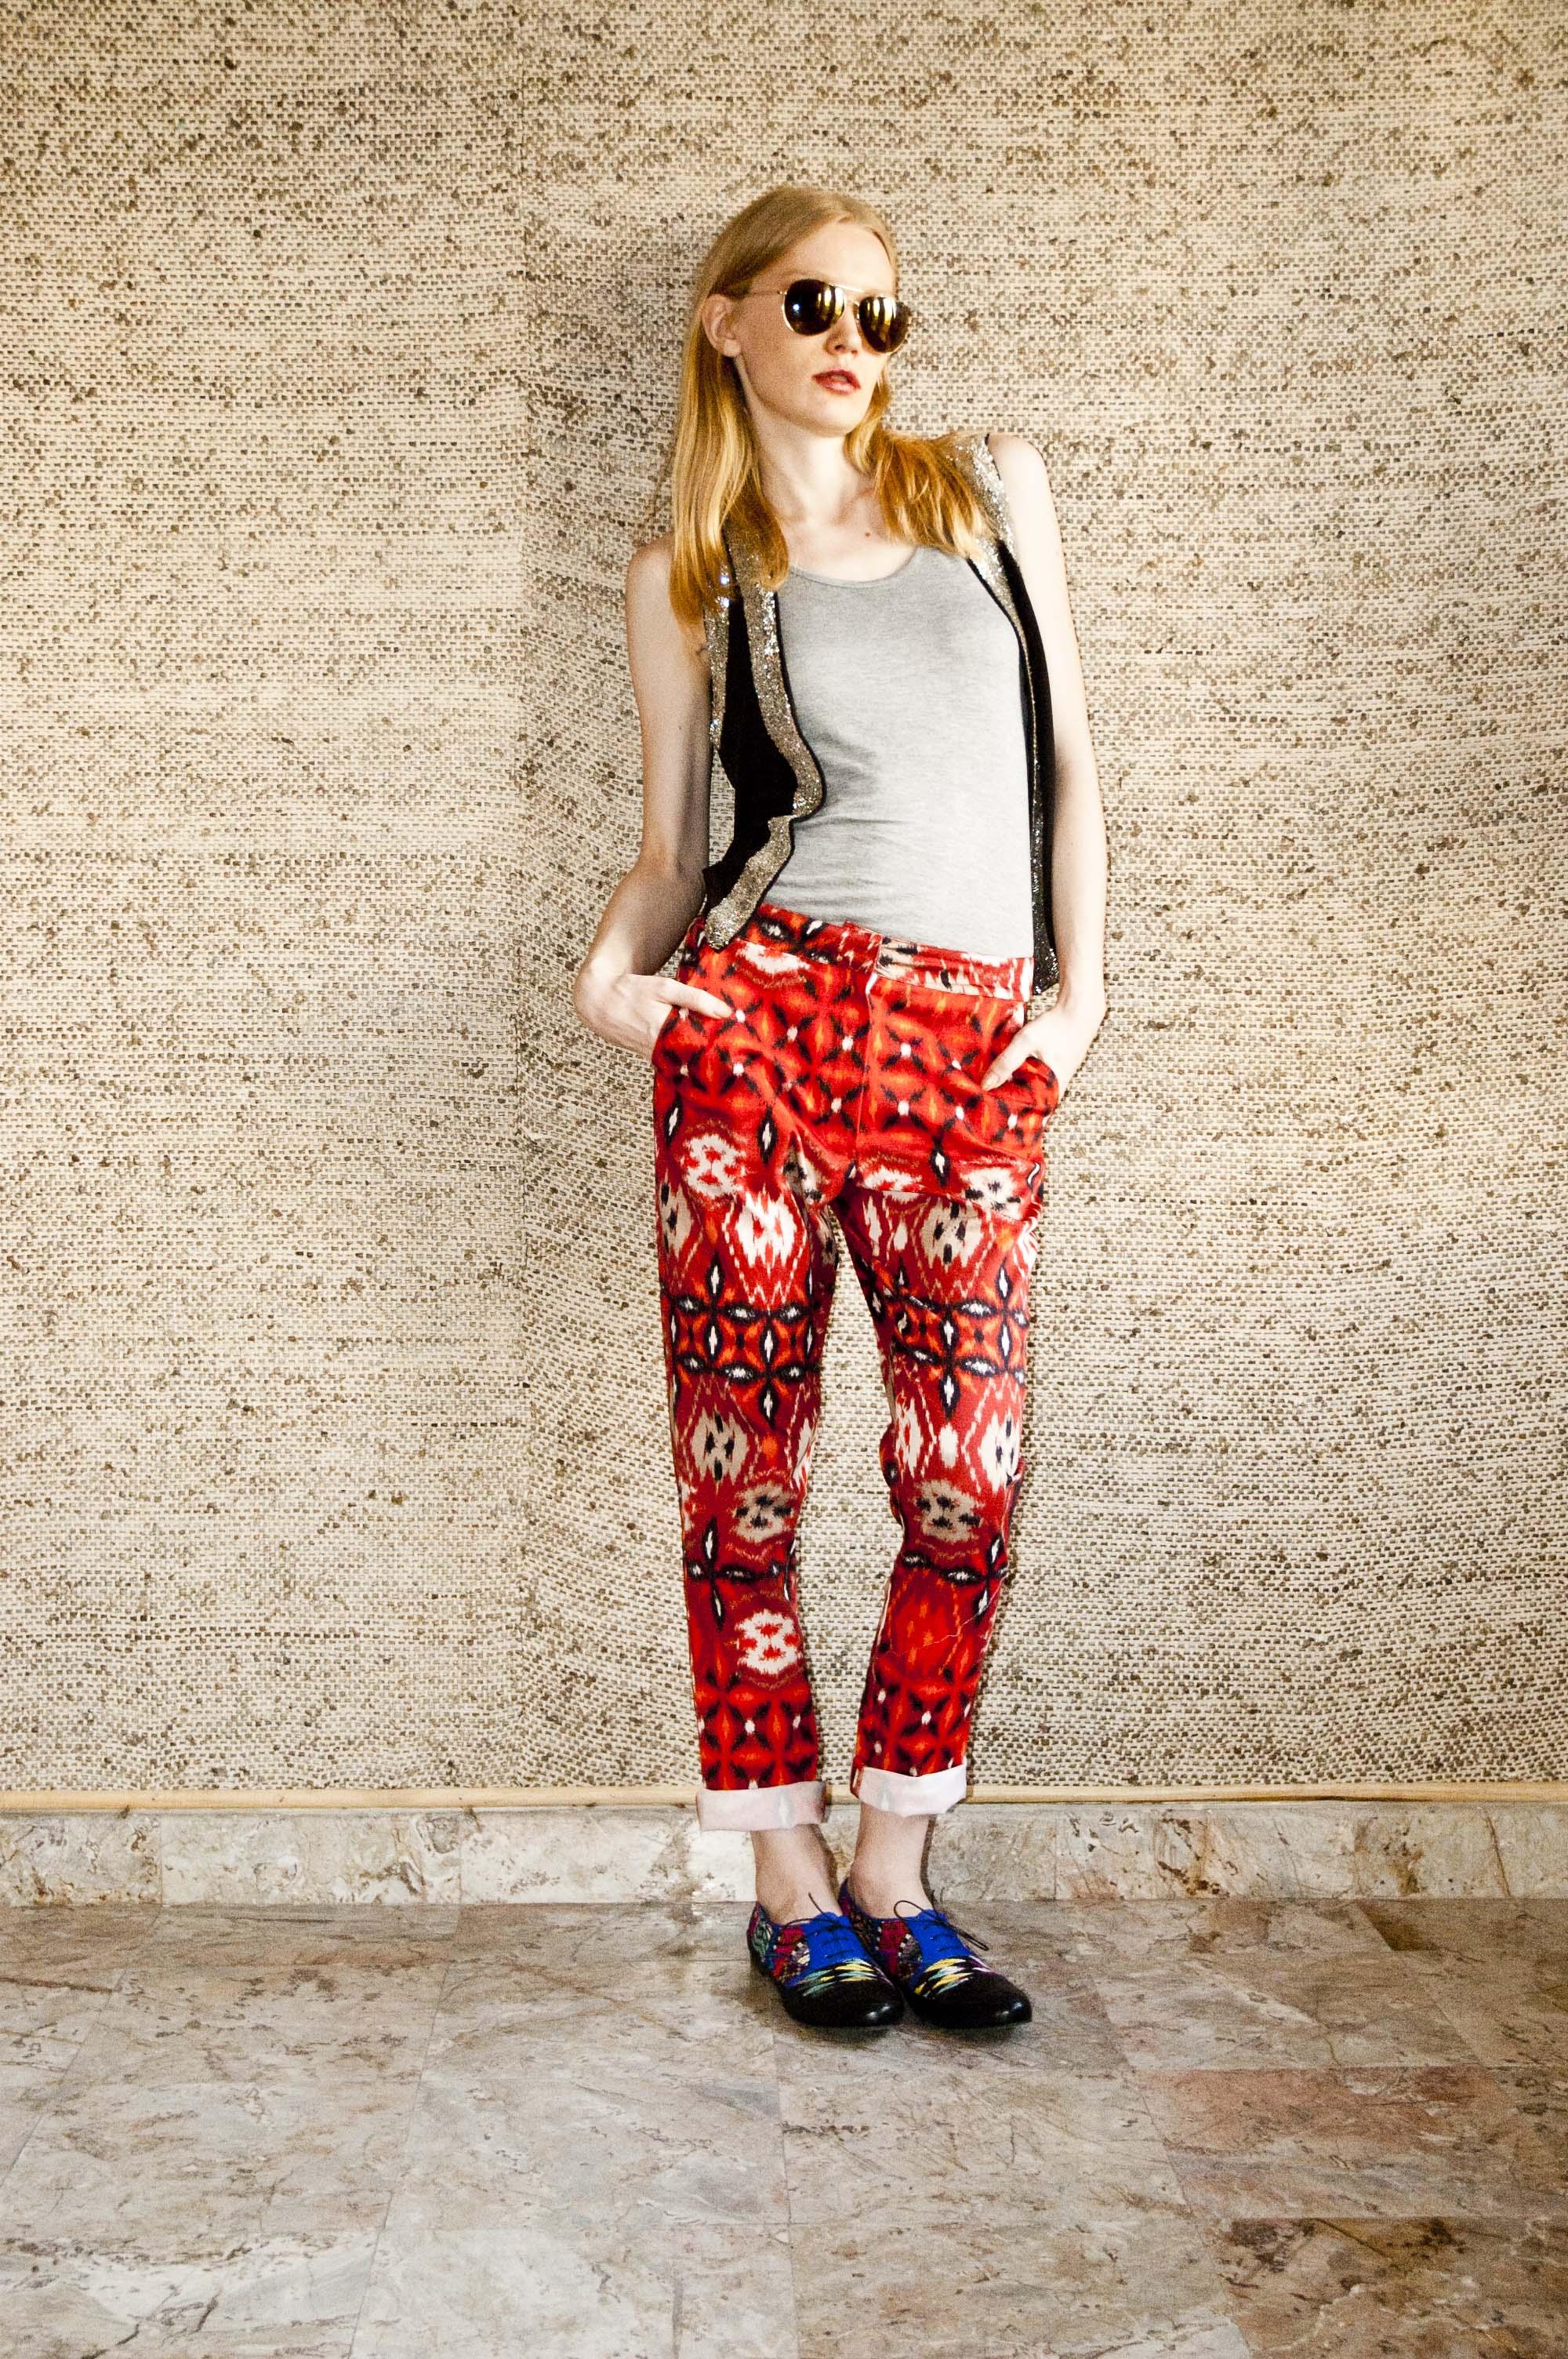 Indian fashion blog